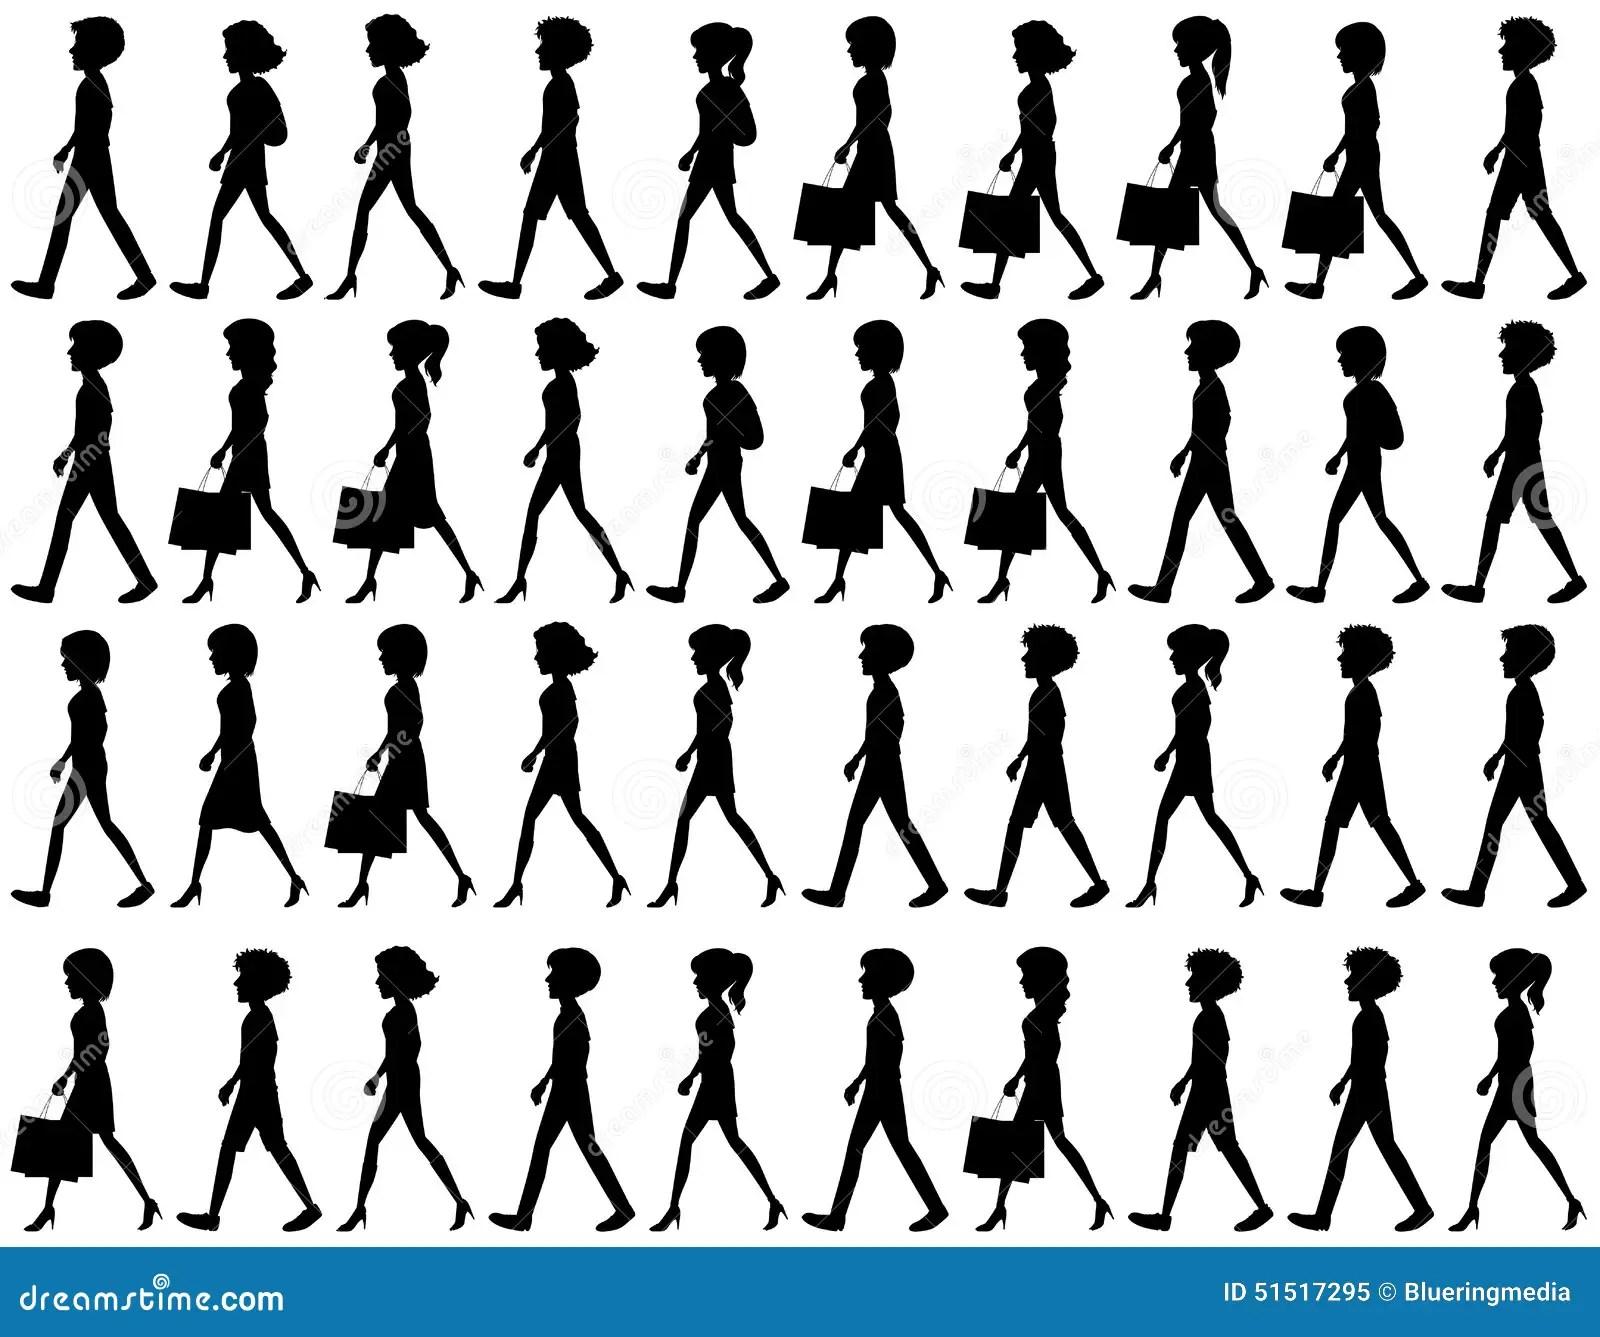 Silhouette Of People Walking Stock Vector